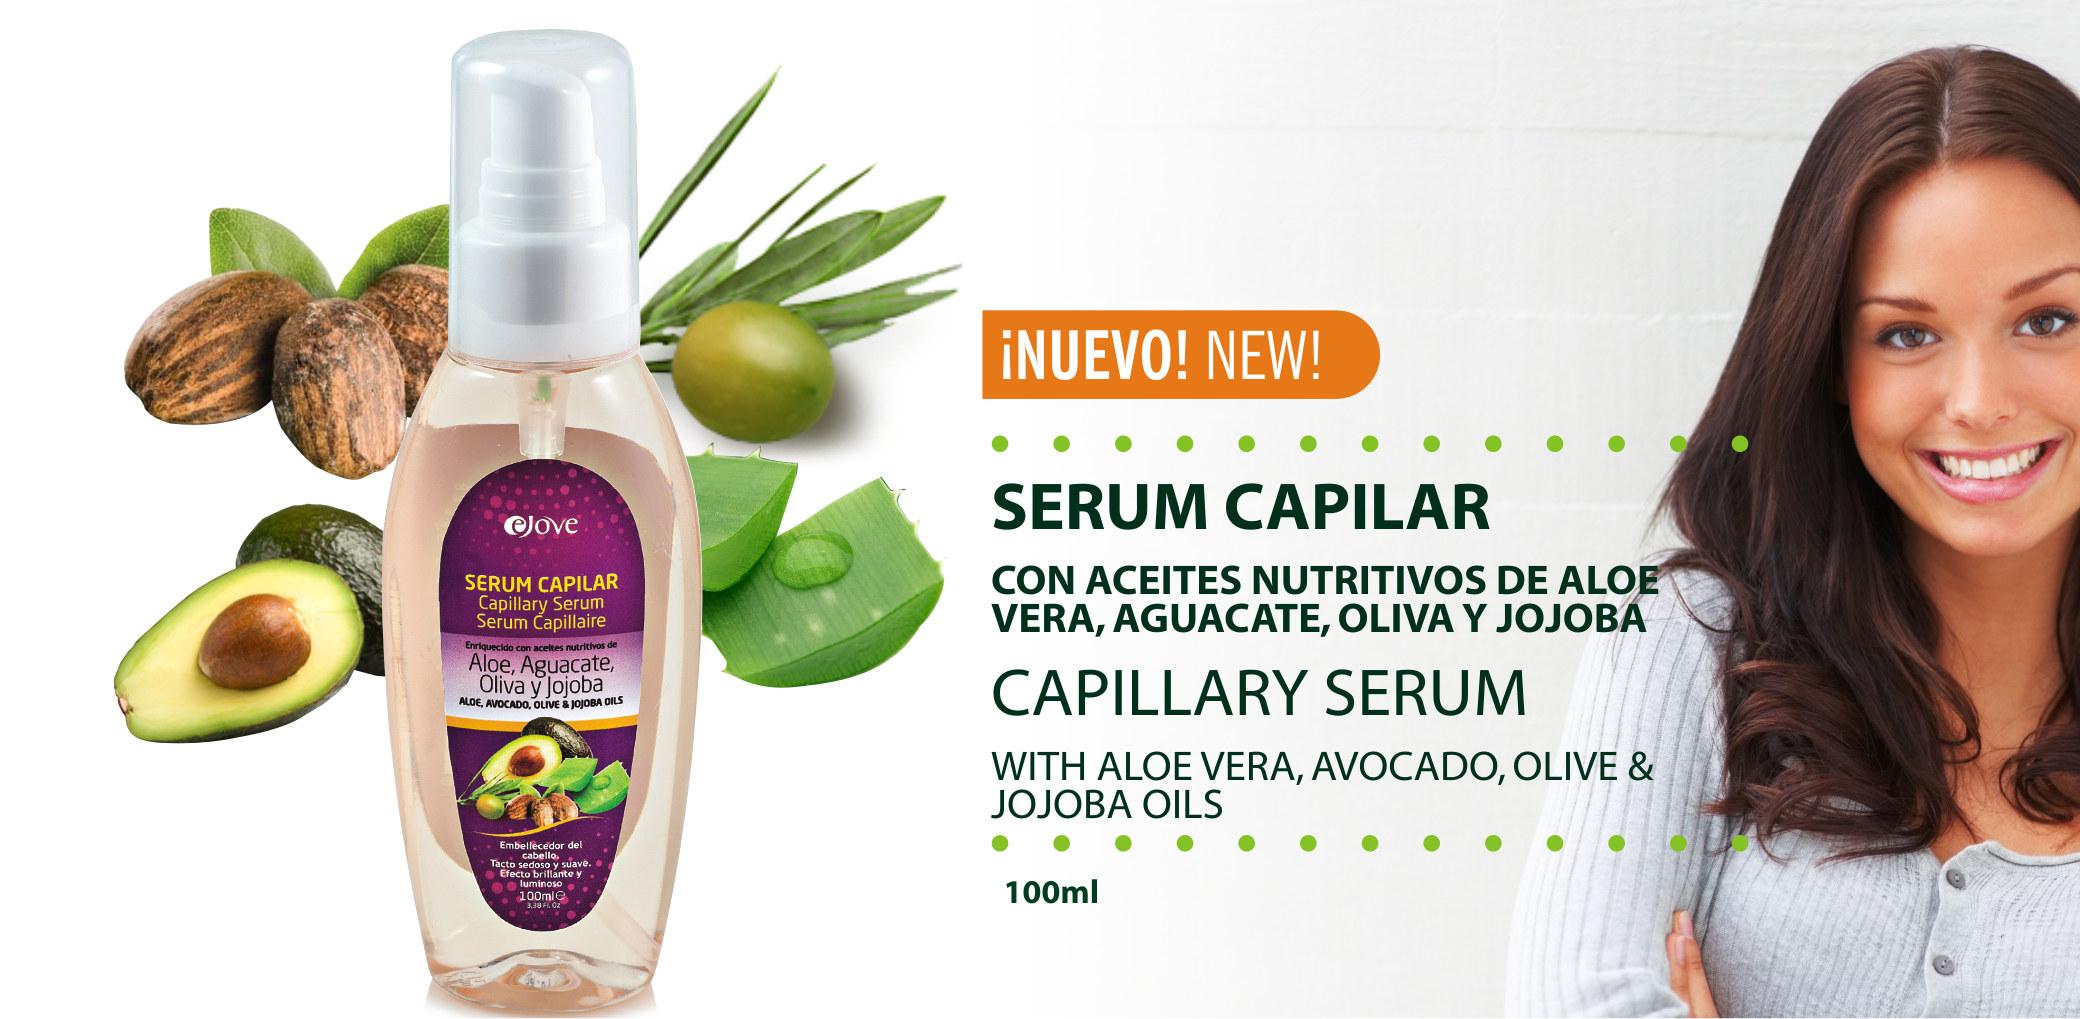 Serum Capilar